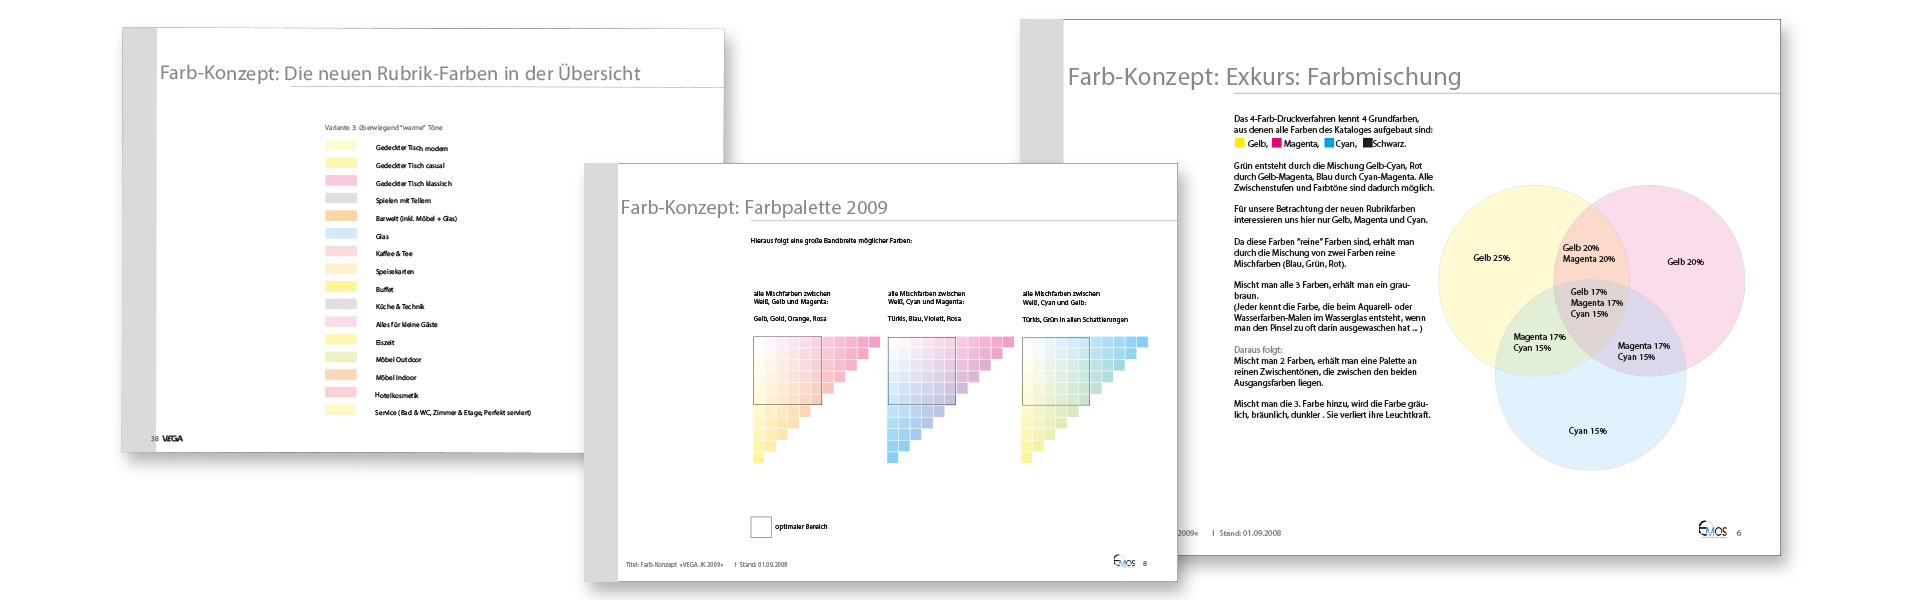 Corporate Design mit Elke Schmalfeld